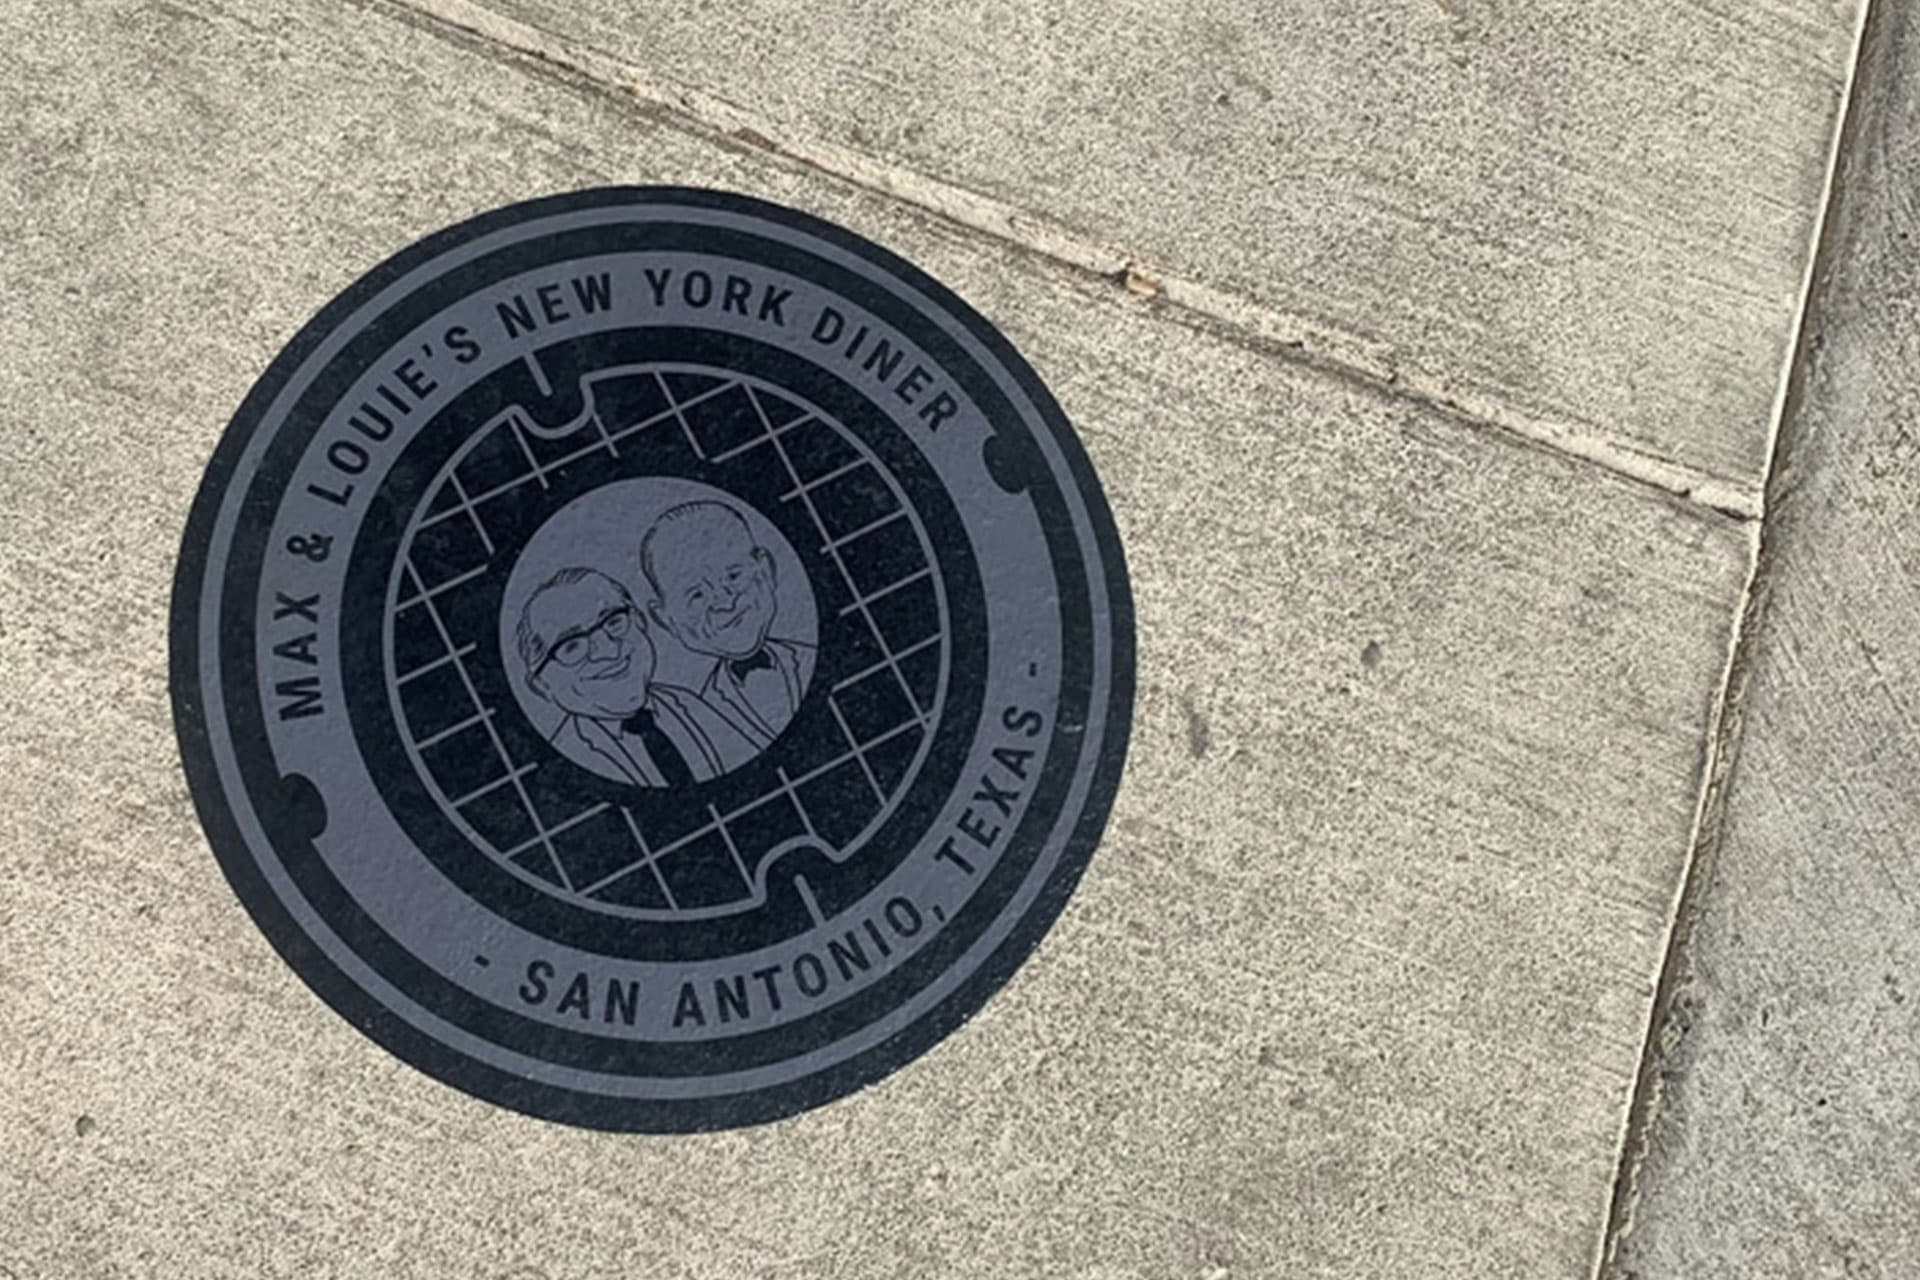 Max & Louie's New York Diner Manhole